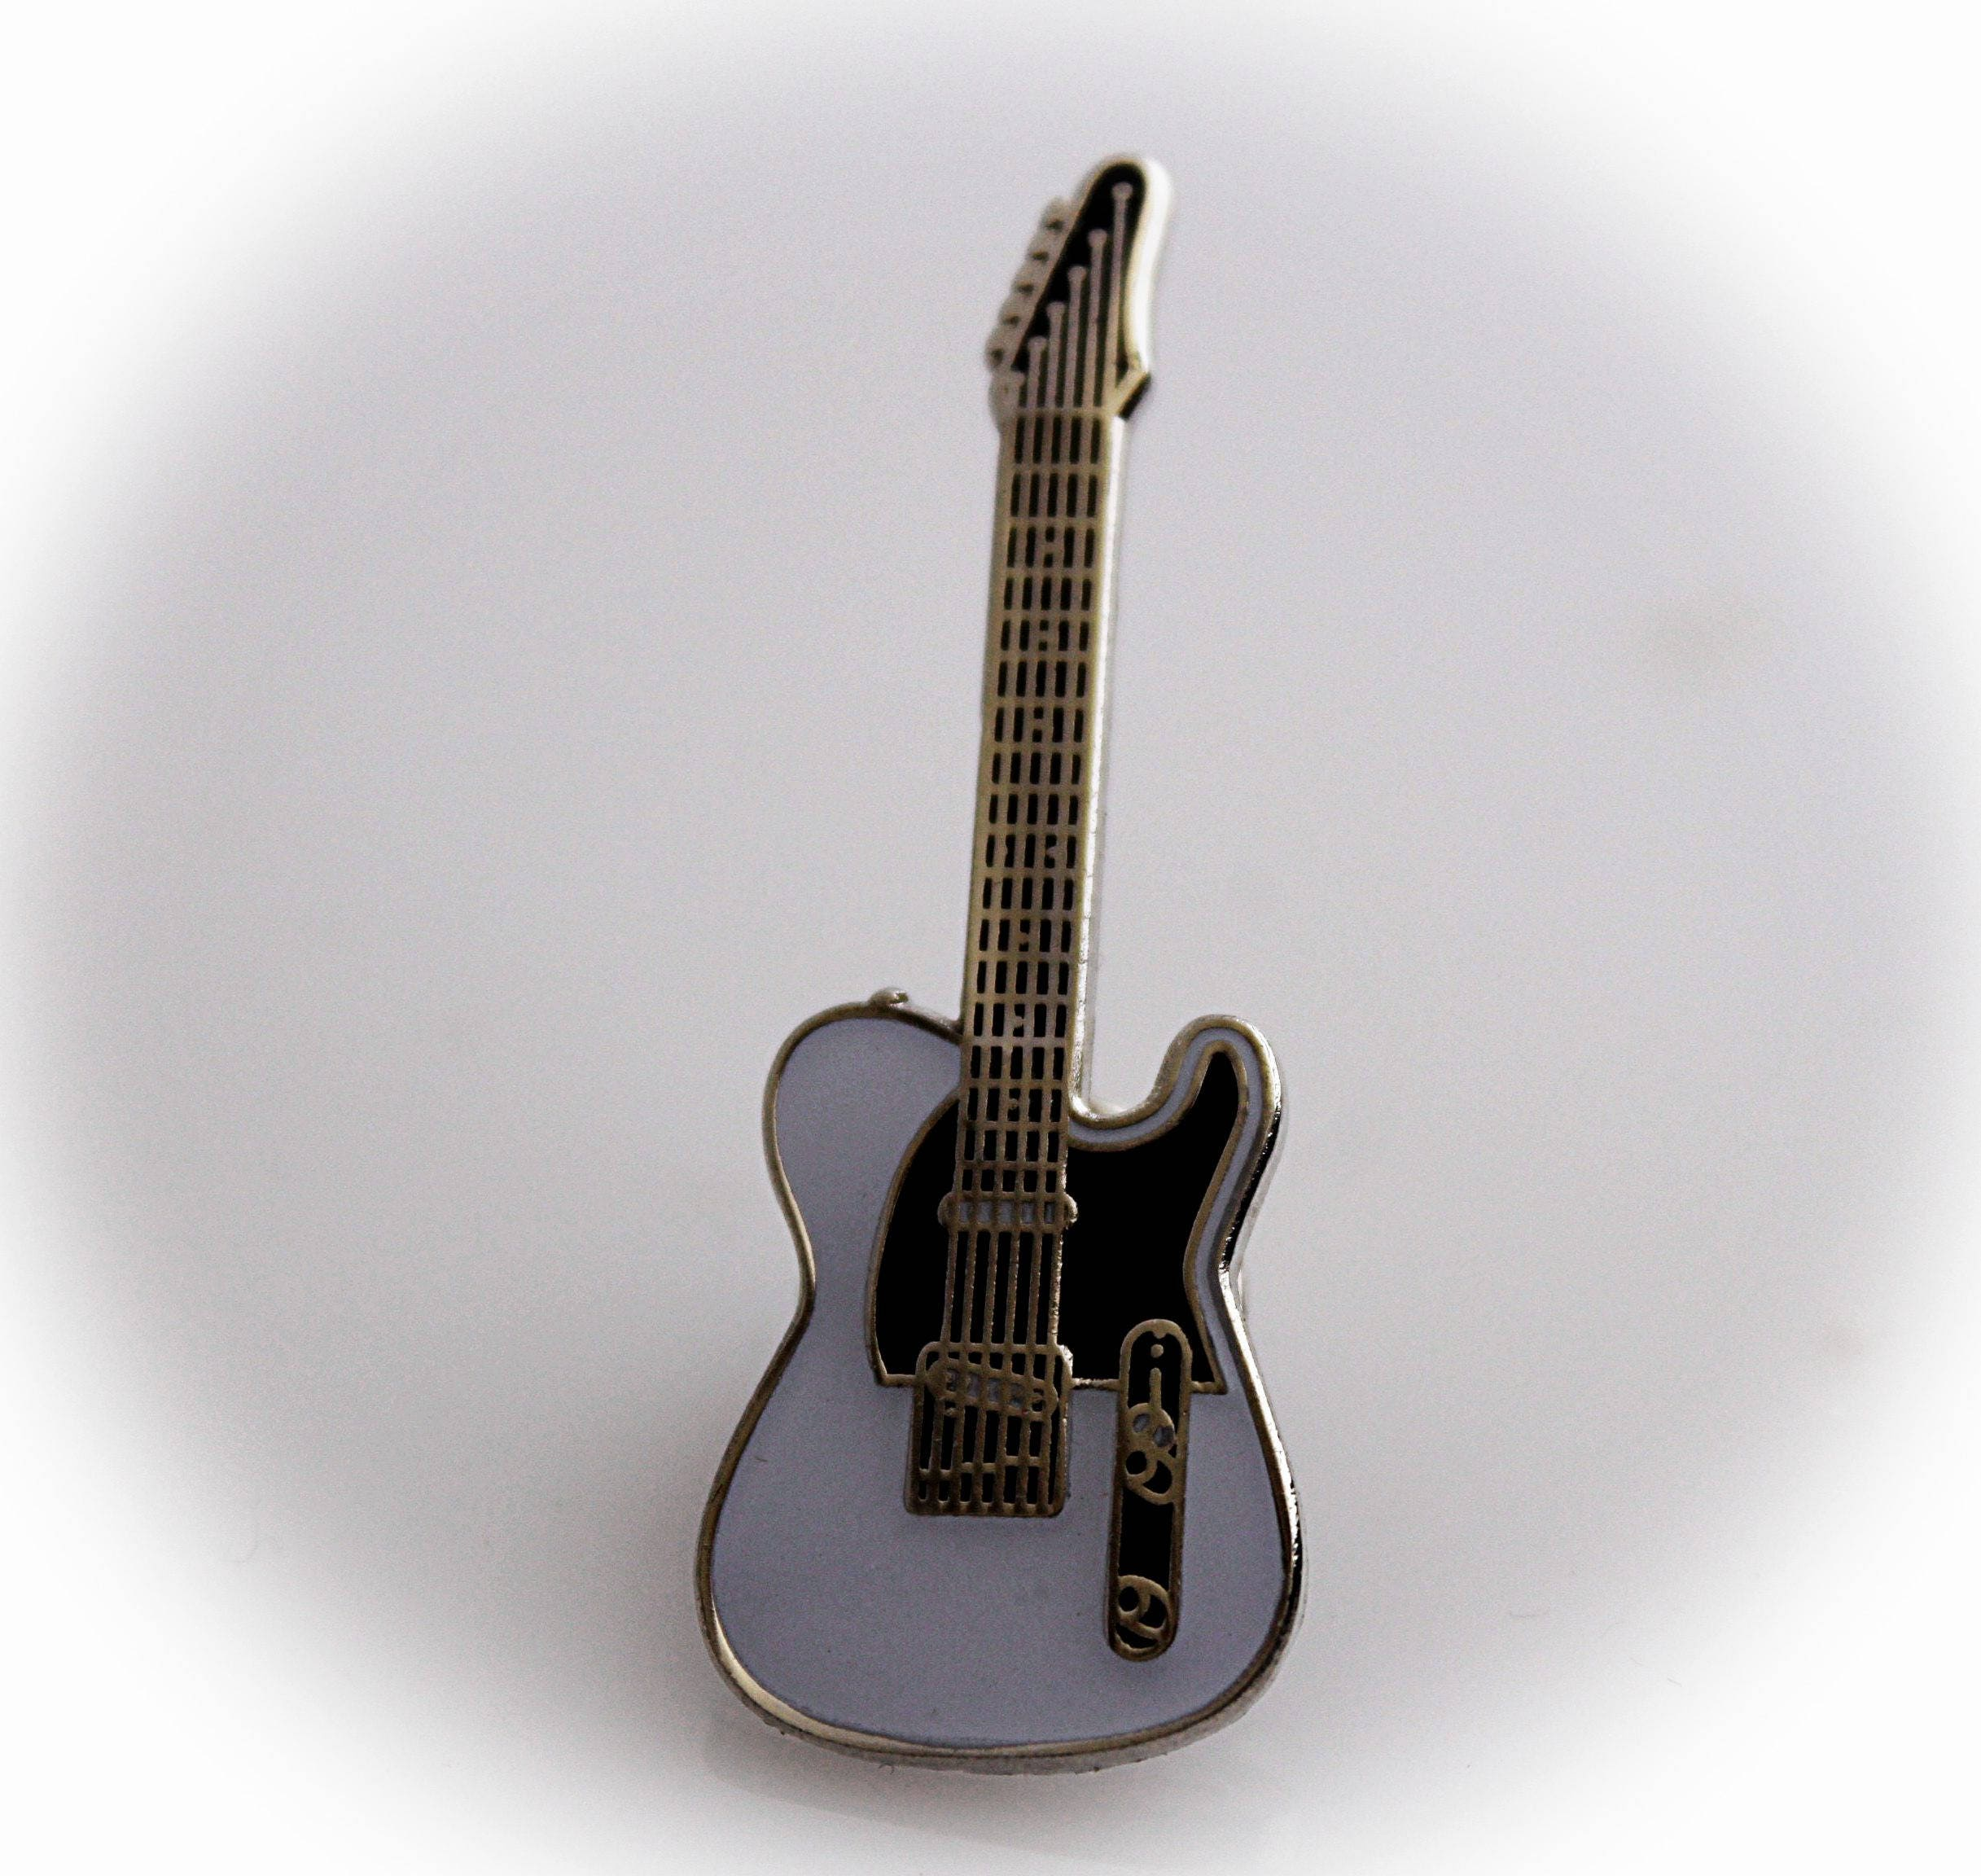 Fender Telecaster Guitar Pin White Yellow Or Black